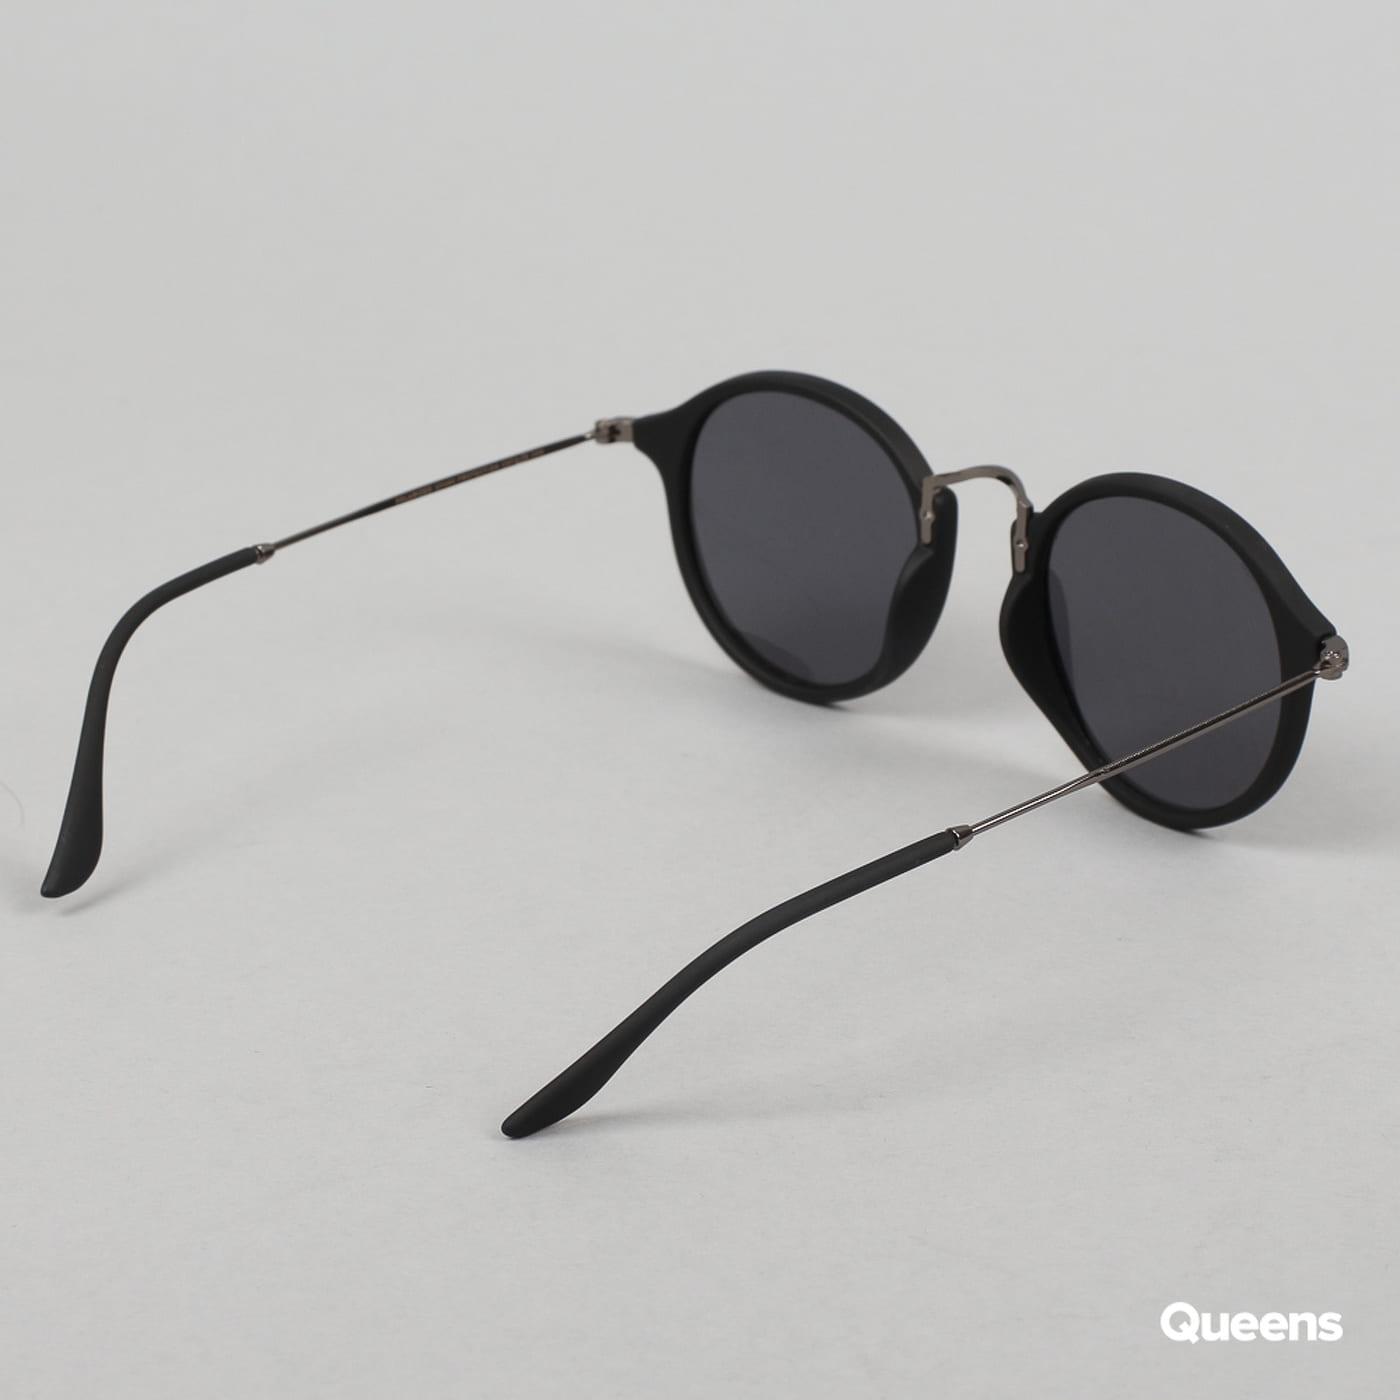 MD Sunglasses Spy black / gray